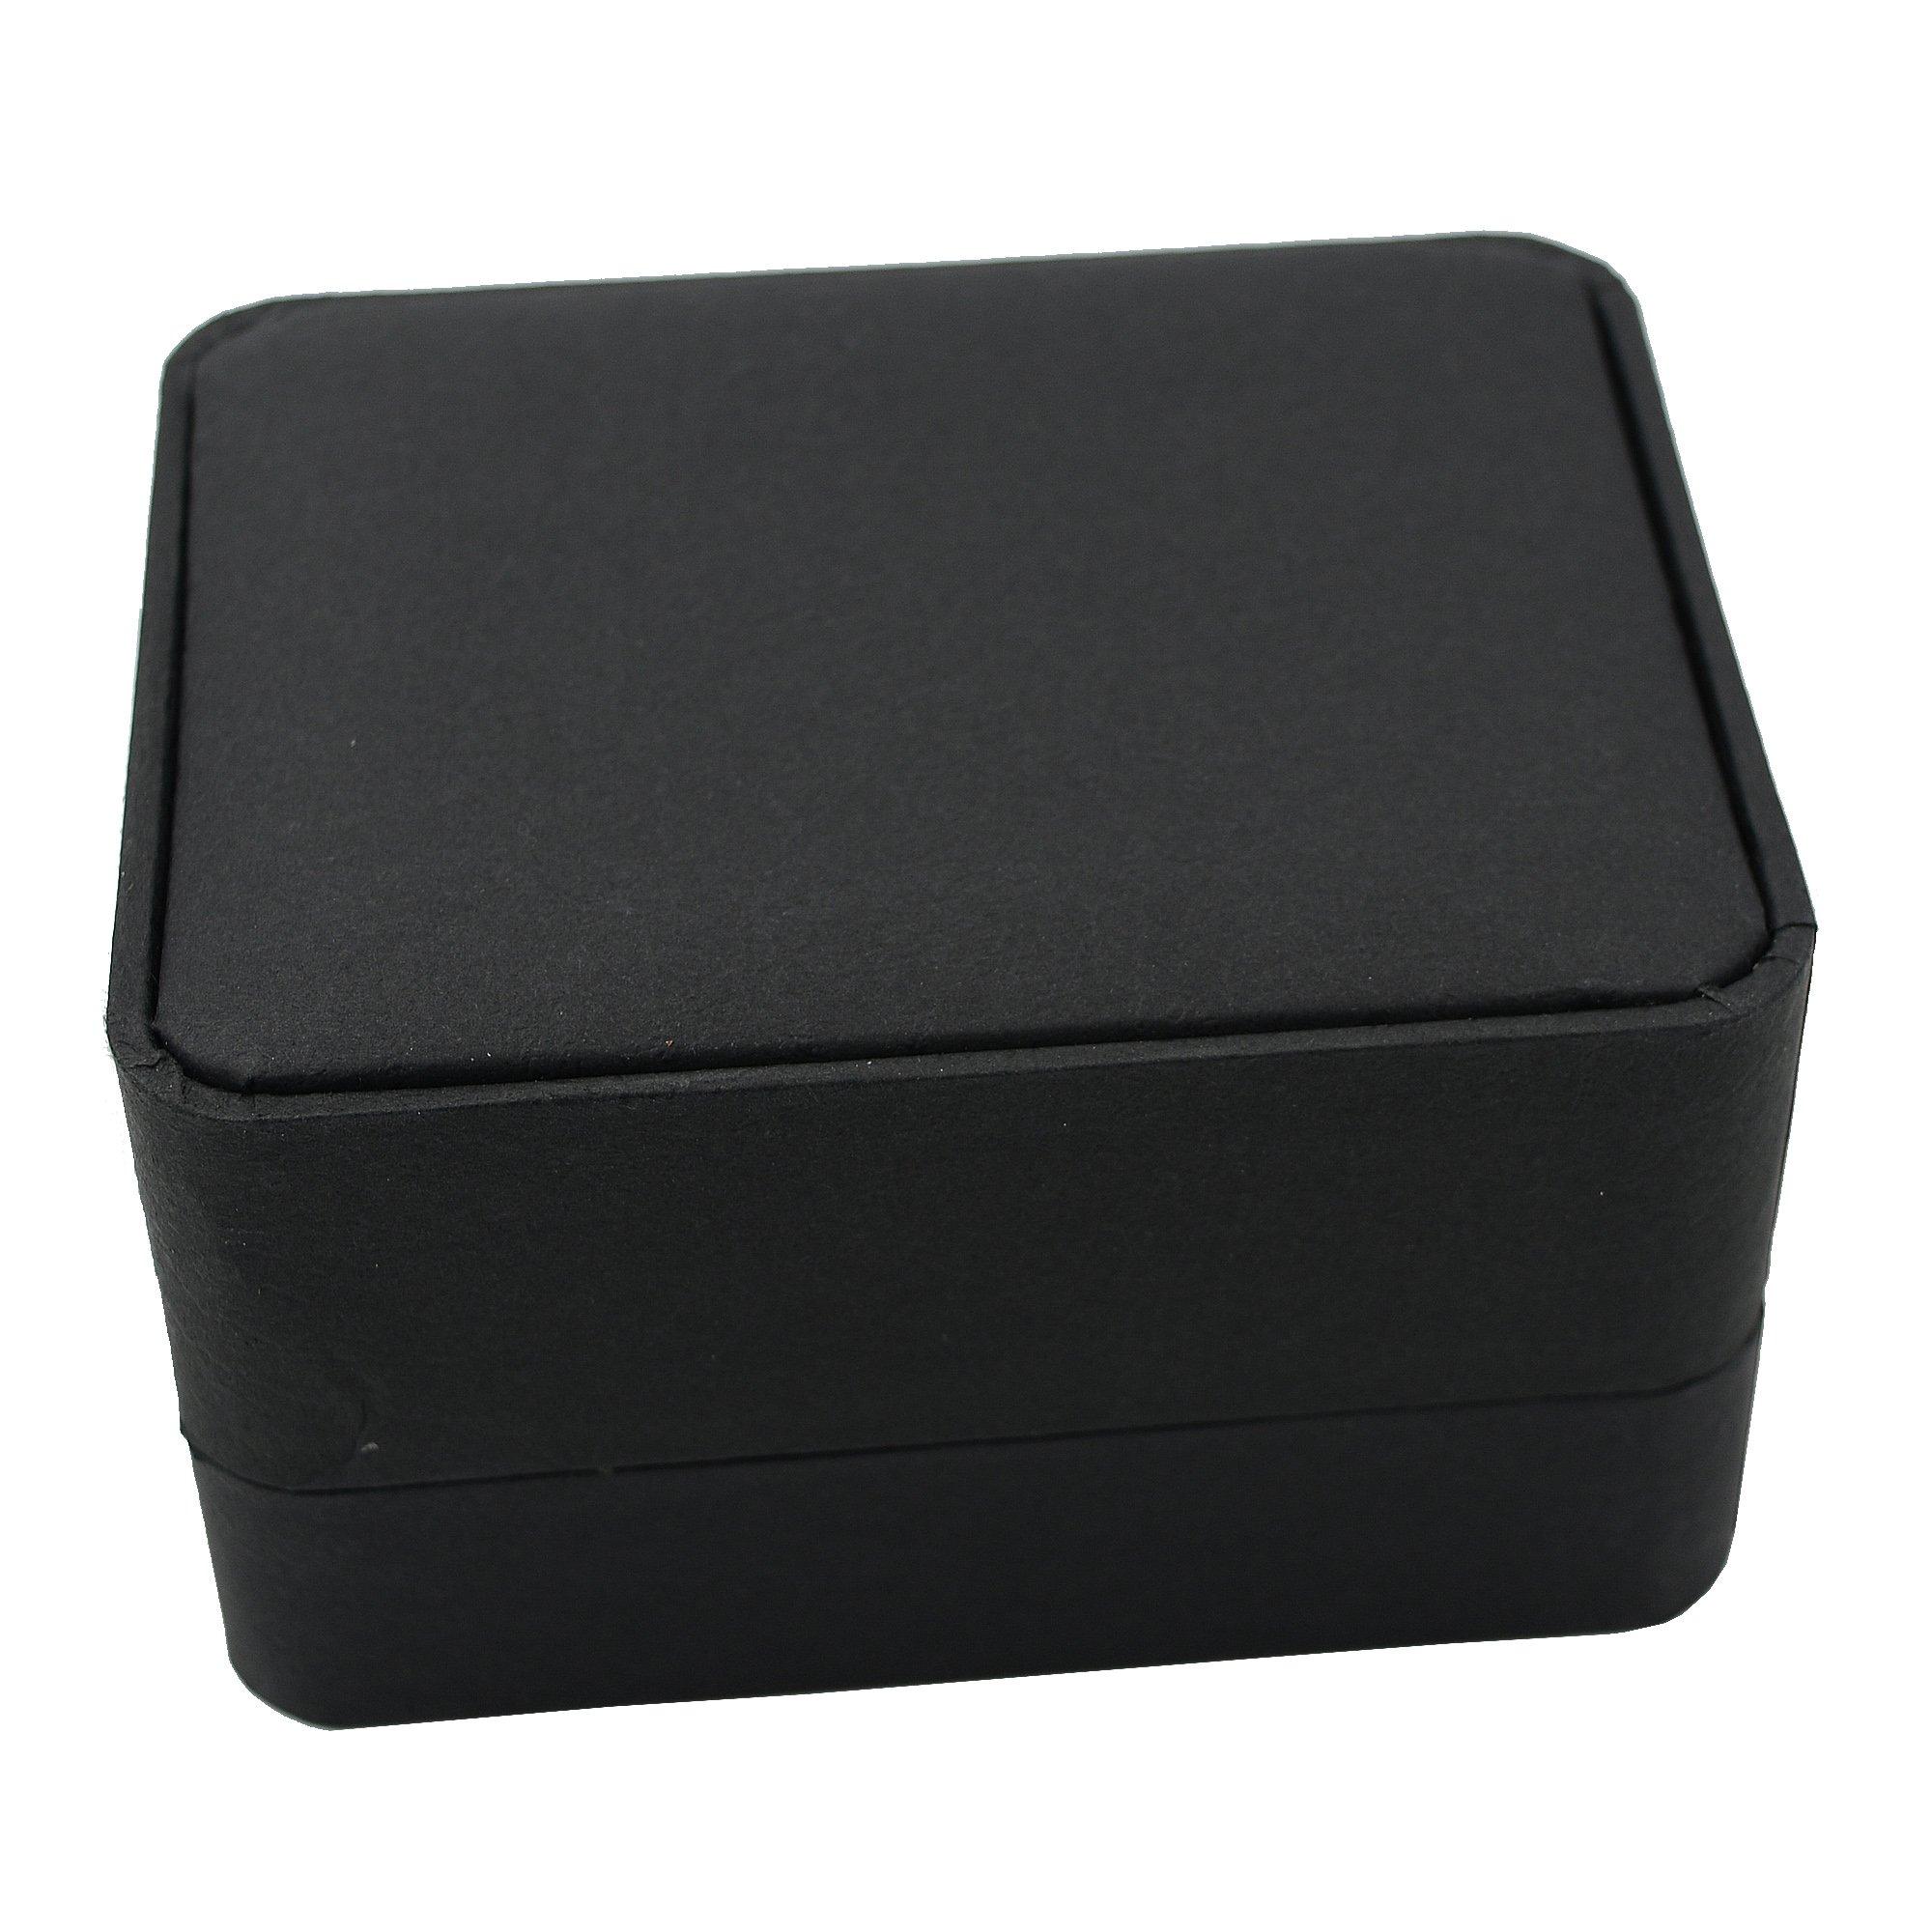 Timeconcept Gift Box Wedding Black Single Pocket Watch Present Bangle Storage Holder Case